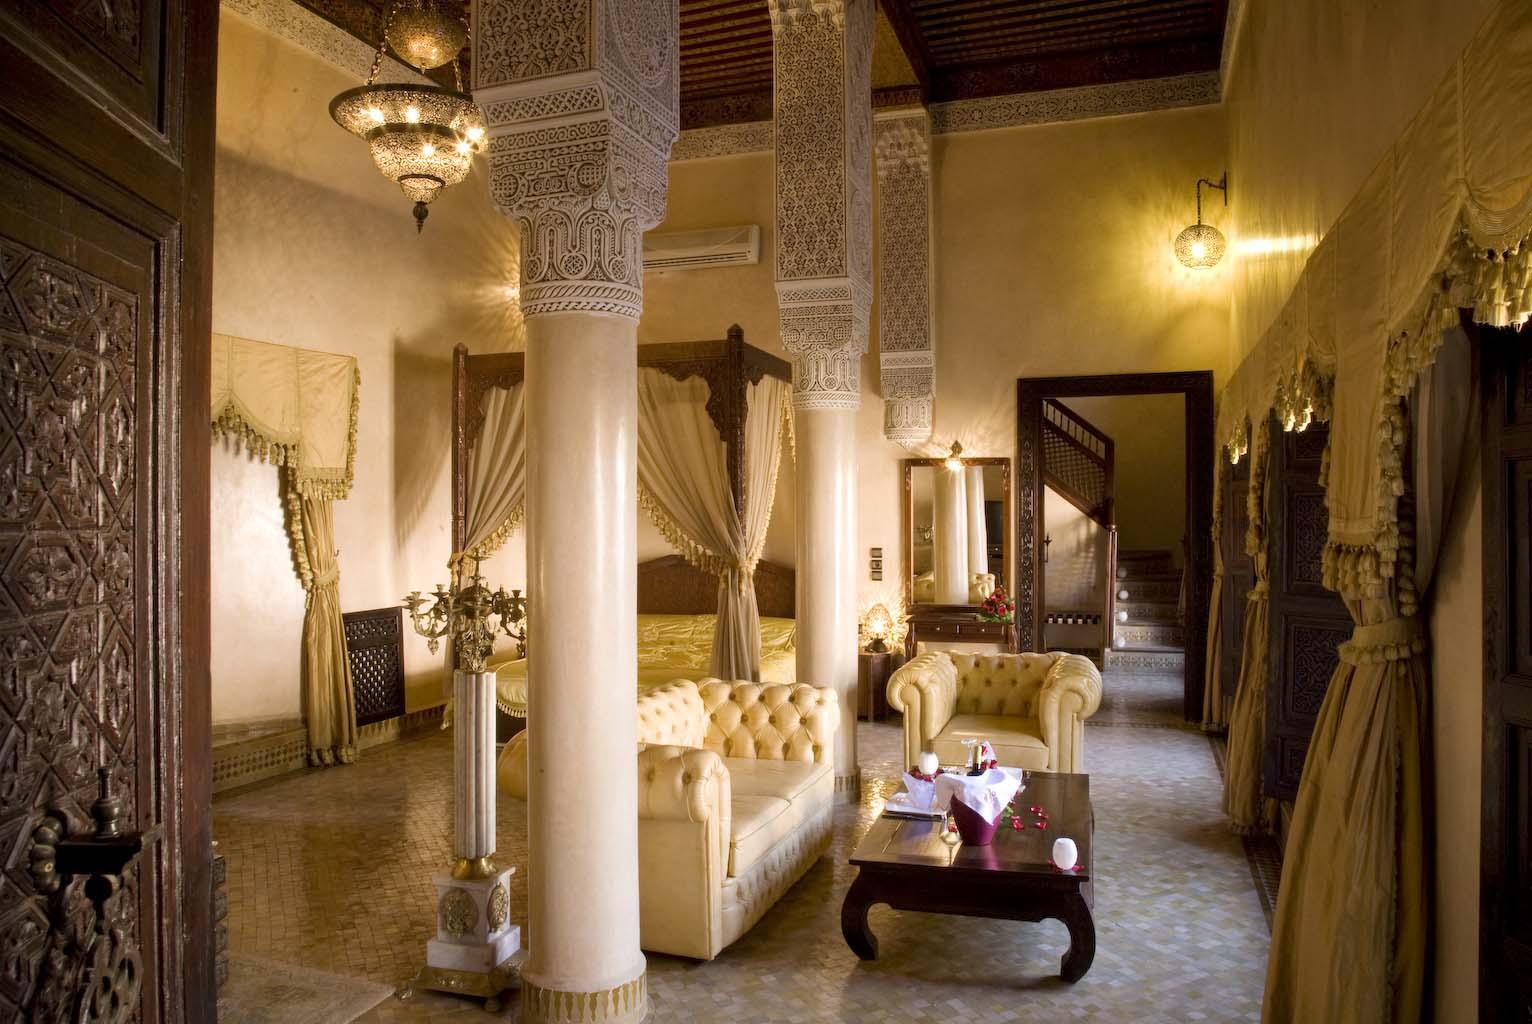 Hu00f4tel de luxe u00e0 Fes : Palais Sheherazade - Suites Royale Riad Fes